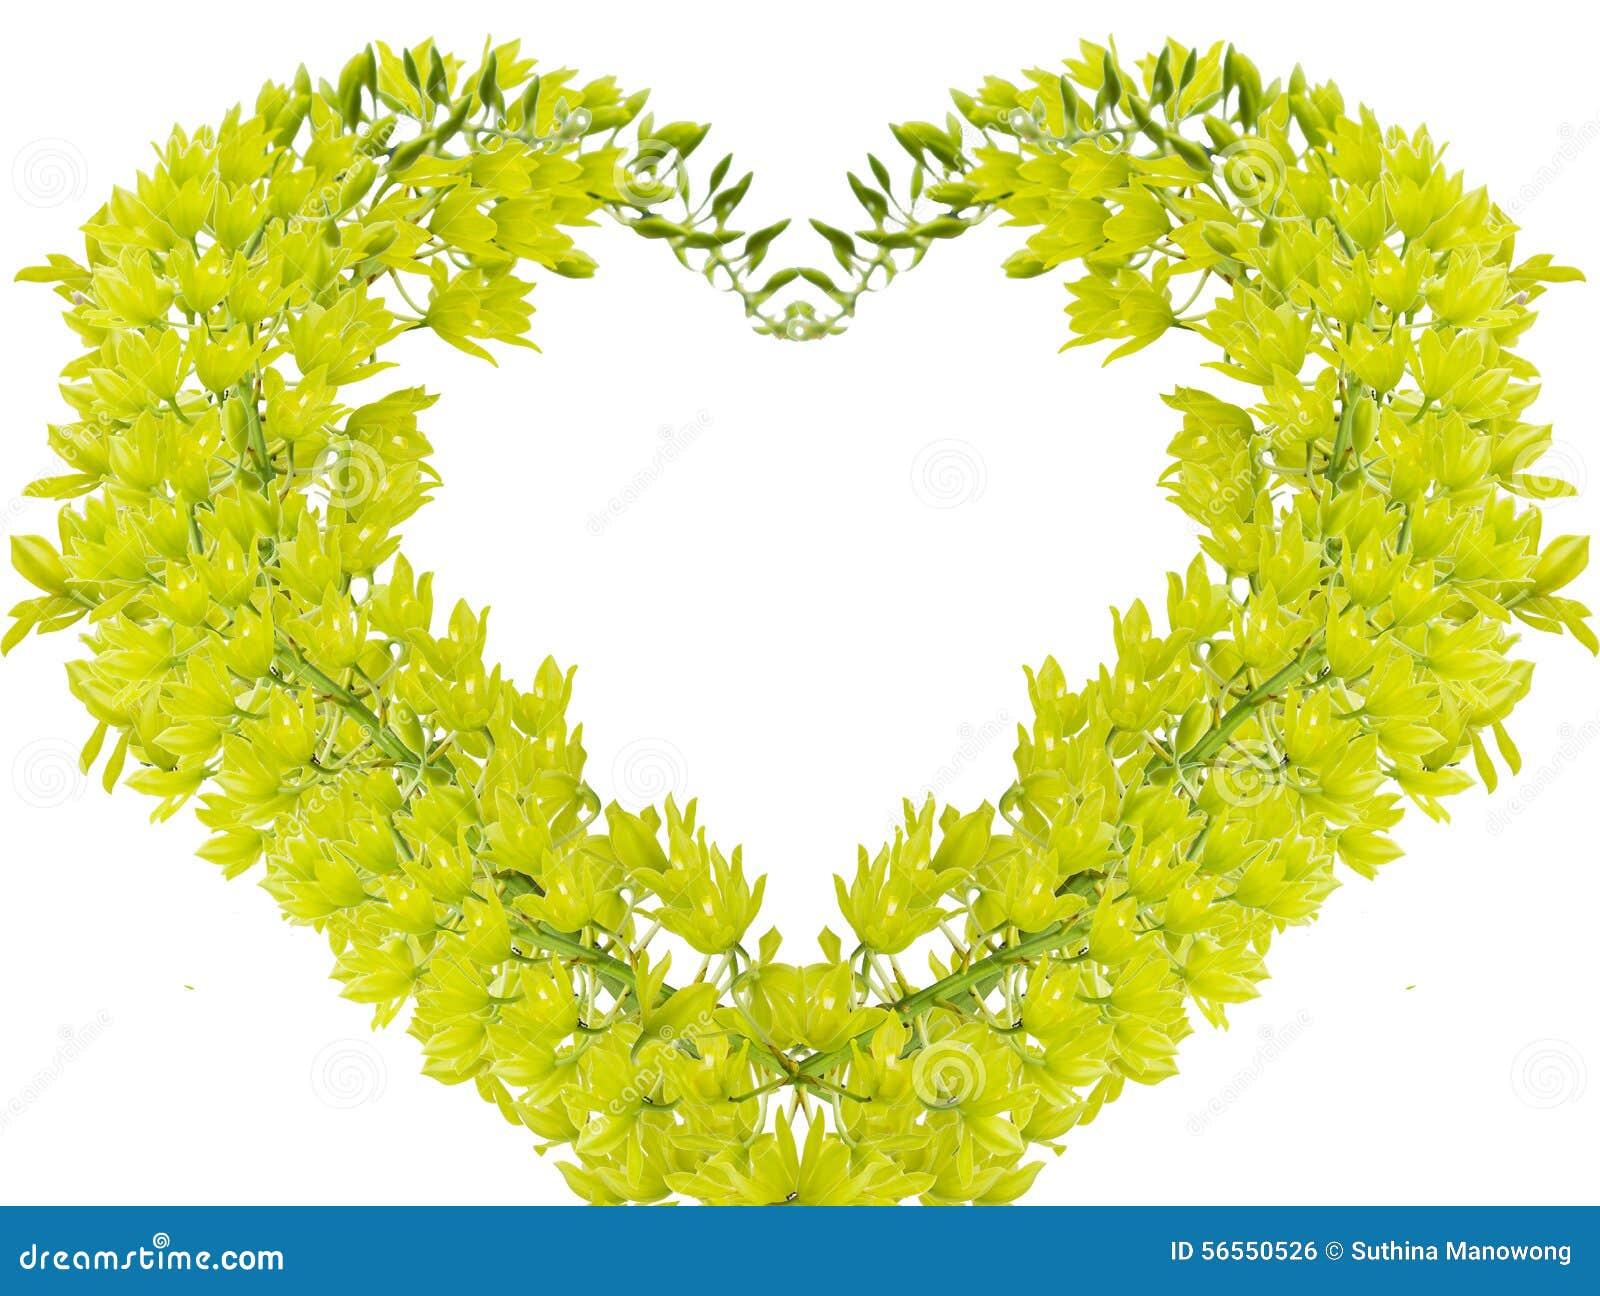 Download πράσινο orchid στοκ εικόνες. εικόνα από ανθοδεσμών, έξυπνο - 56550526